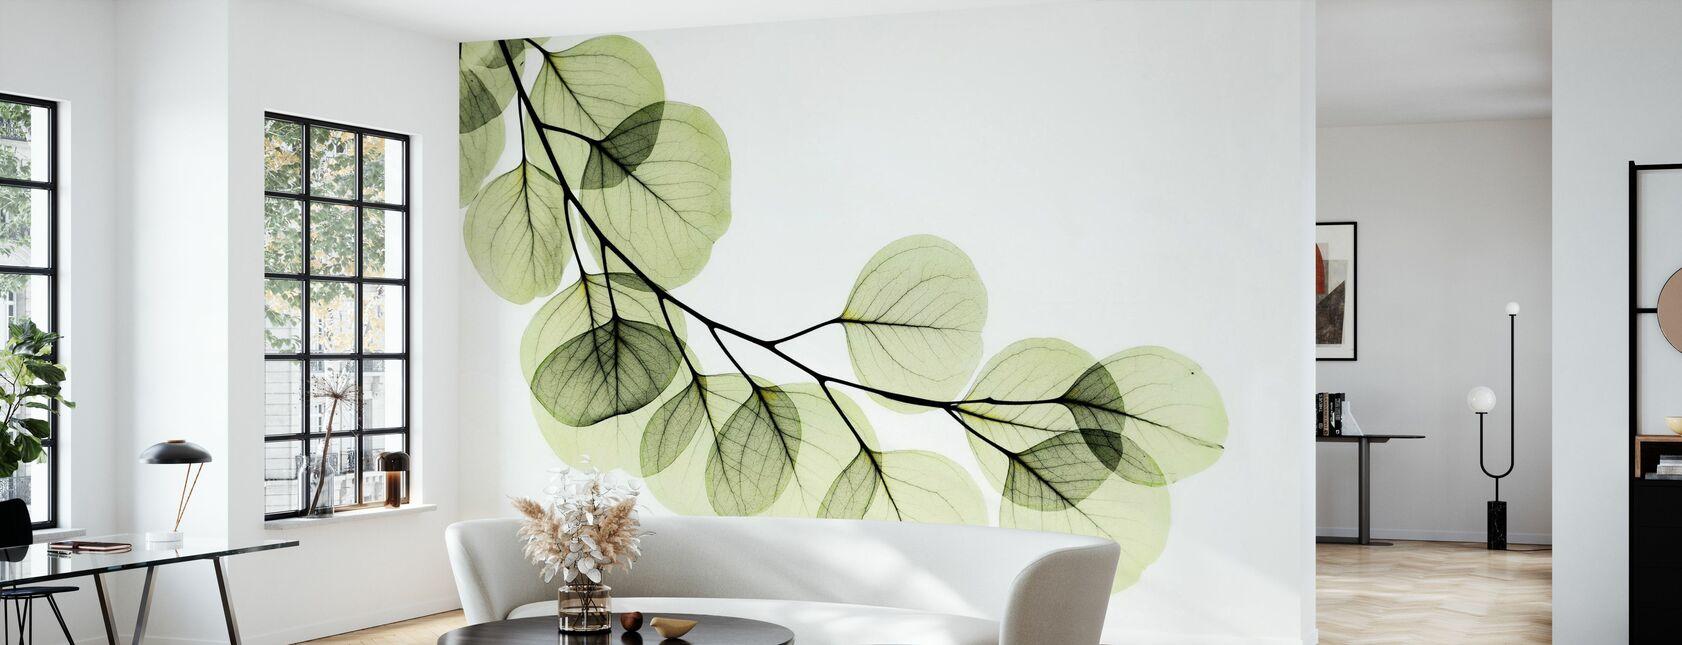 Eukalyptus - Tapet - Stue